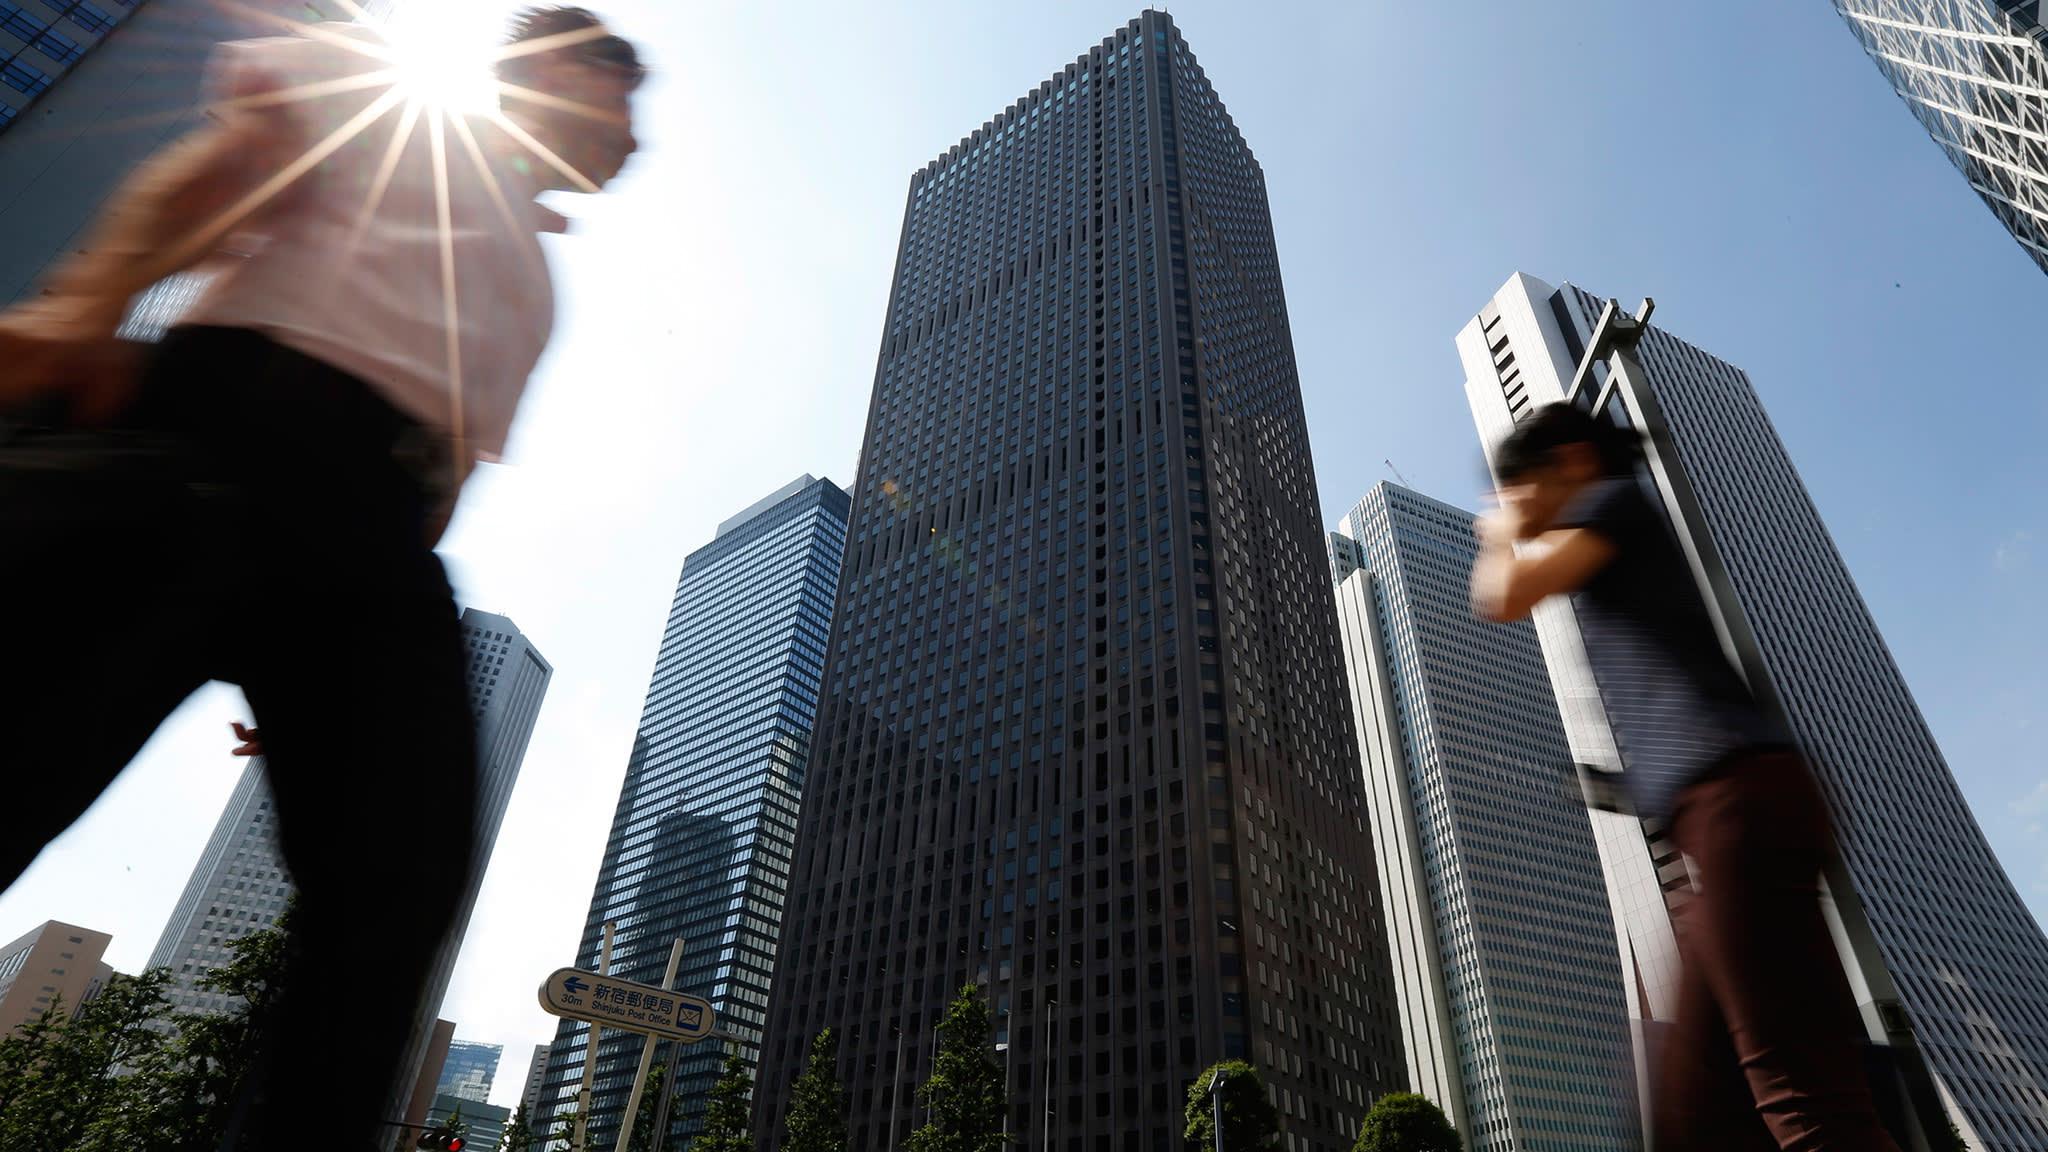 Japan banks target fintech start-ups after law change   Financial Times